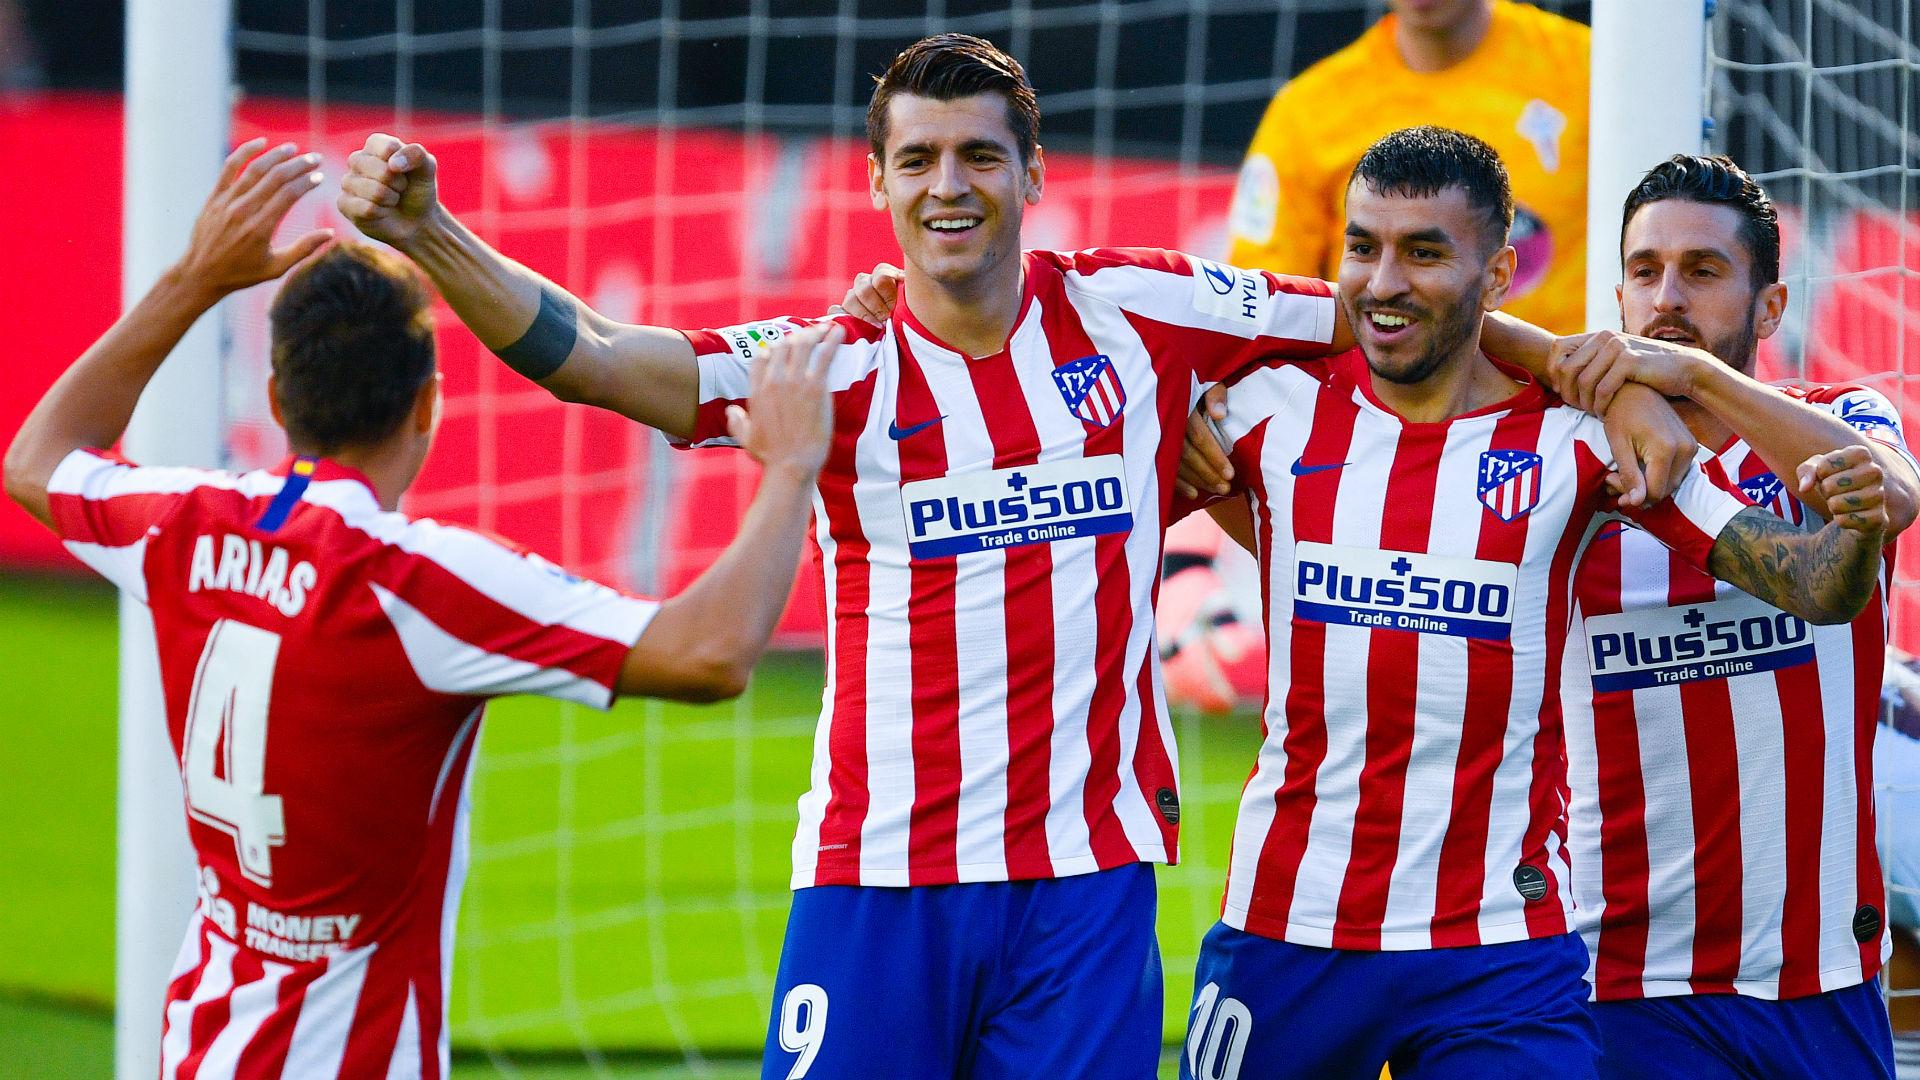 Celta Vigo 1-1 Atletico Madrid: All square after Morata scores fastest goal of LaLiga season